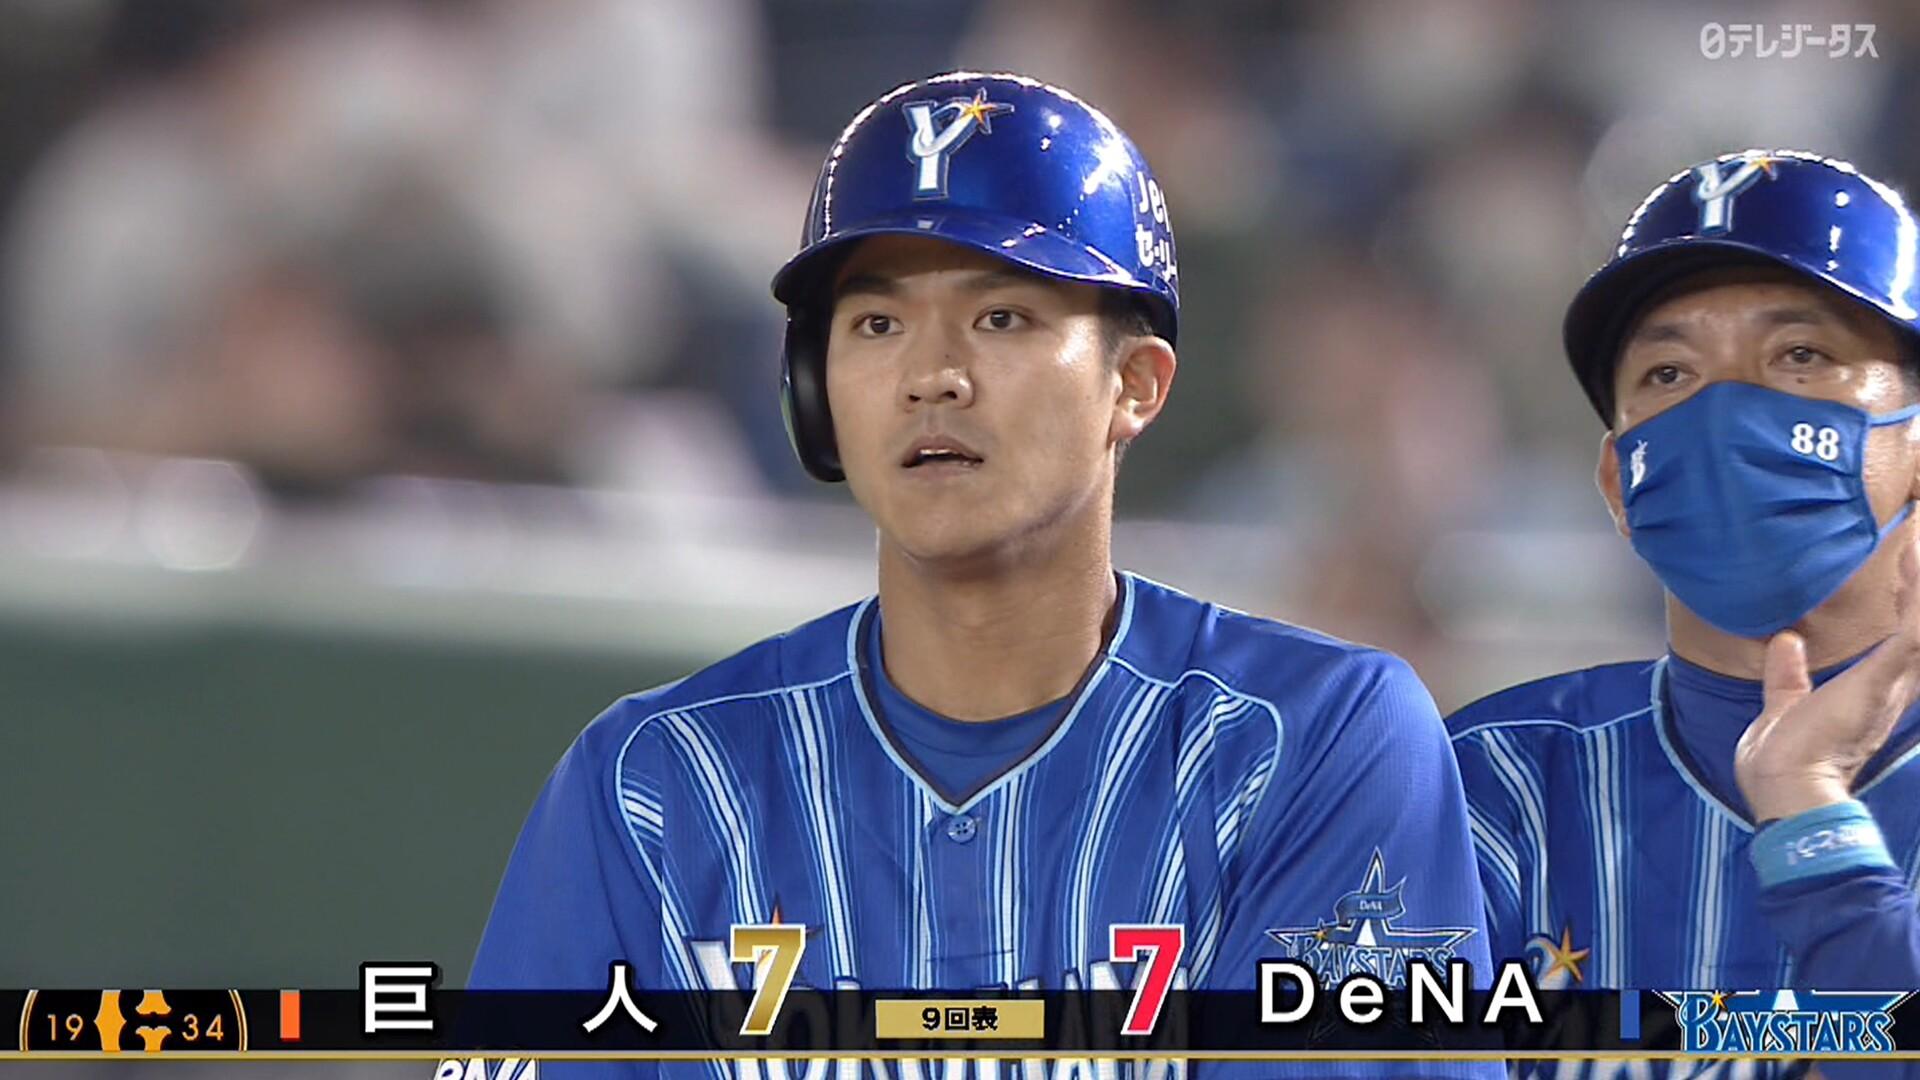 DeNA・田中俊太、恩返しの6打点wwwwww